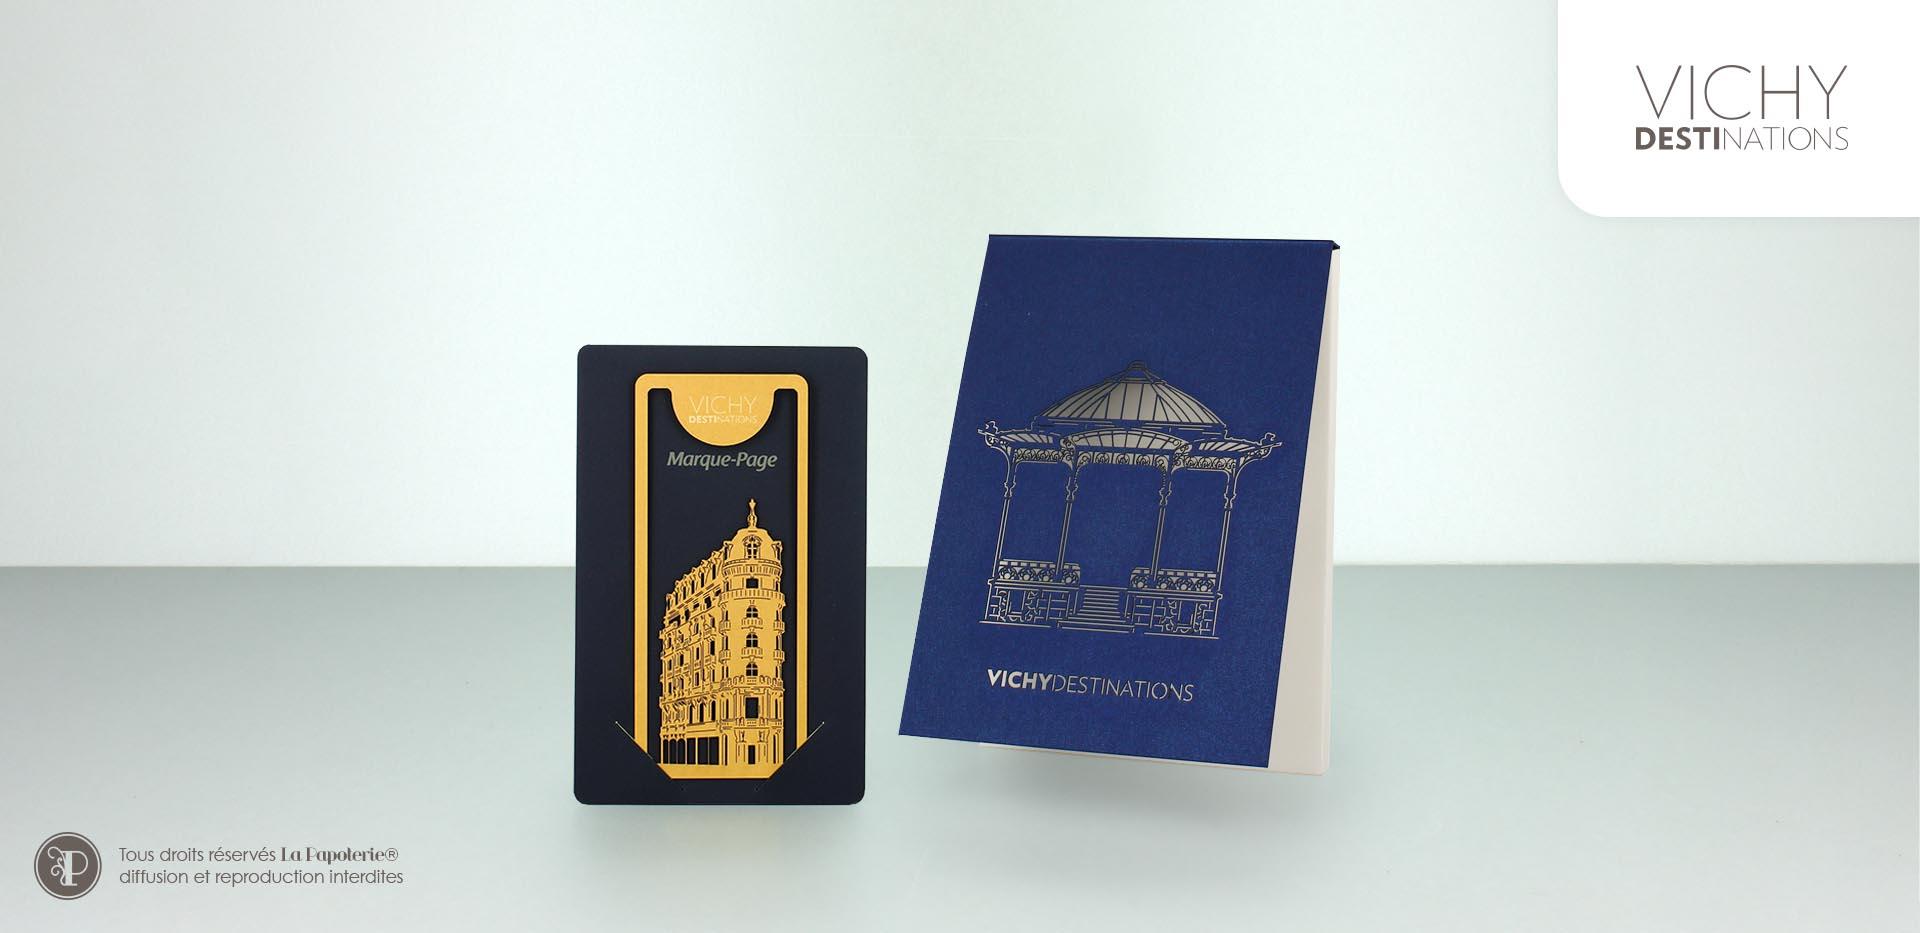 La Papoterie vichy-destinations-marque-page-a6 Assortiment Vichy